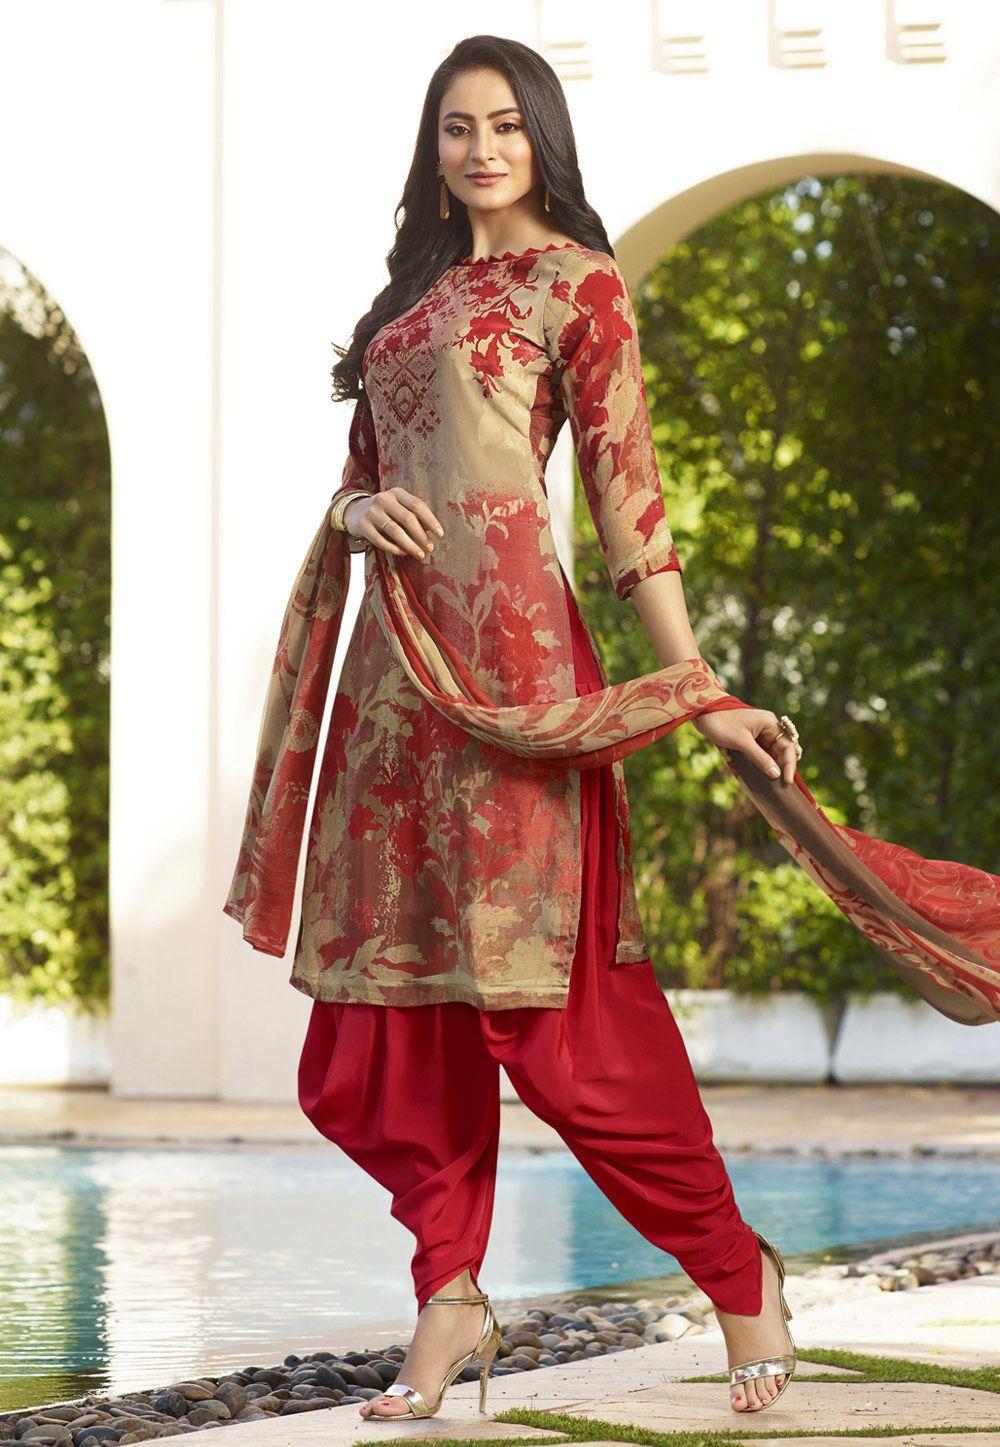 d9795a87ba Buy Beige Crepe Punjabi Suit 156650 online at lowest price from huge  collection of salwar kameez at Indianclothstore.com.